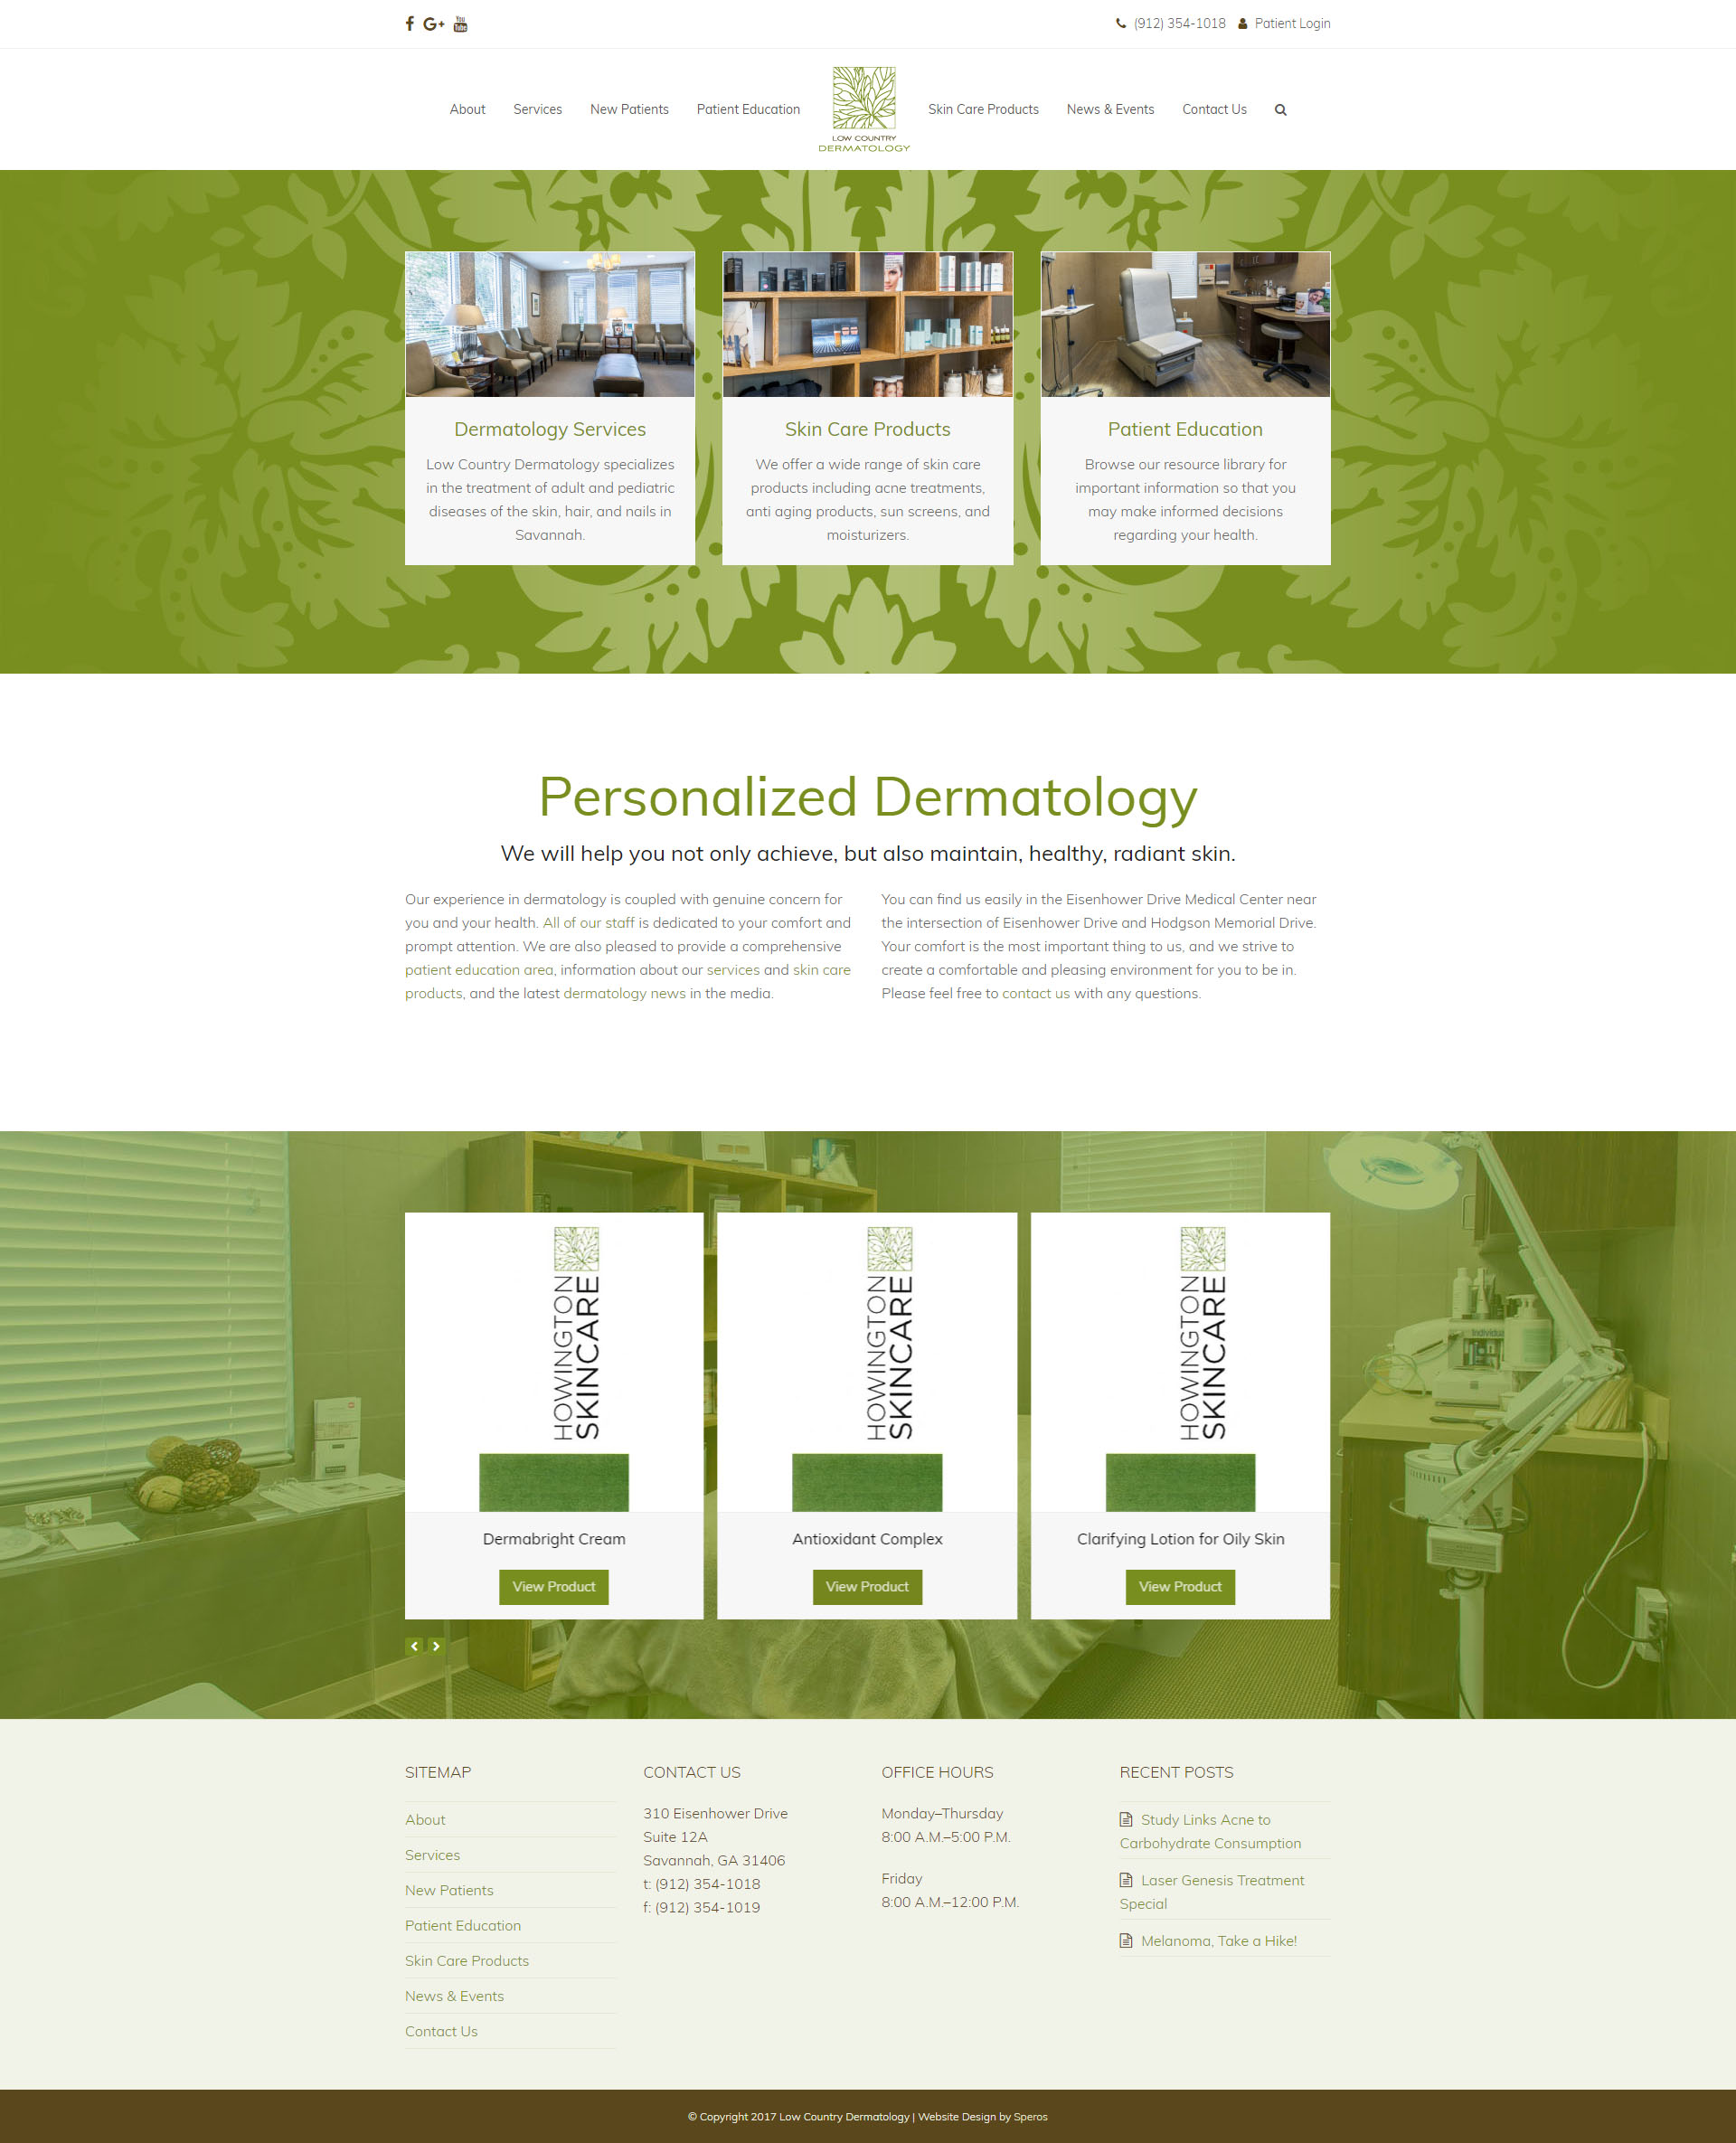 Low Country Dermatology - Speros Web Design - Savannah